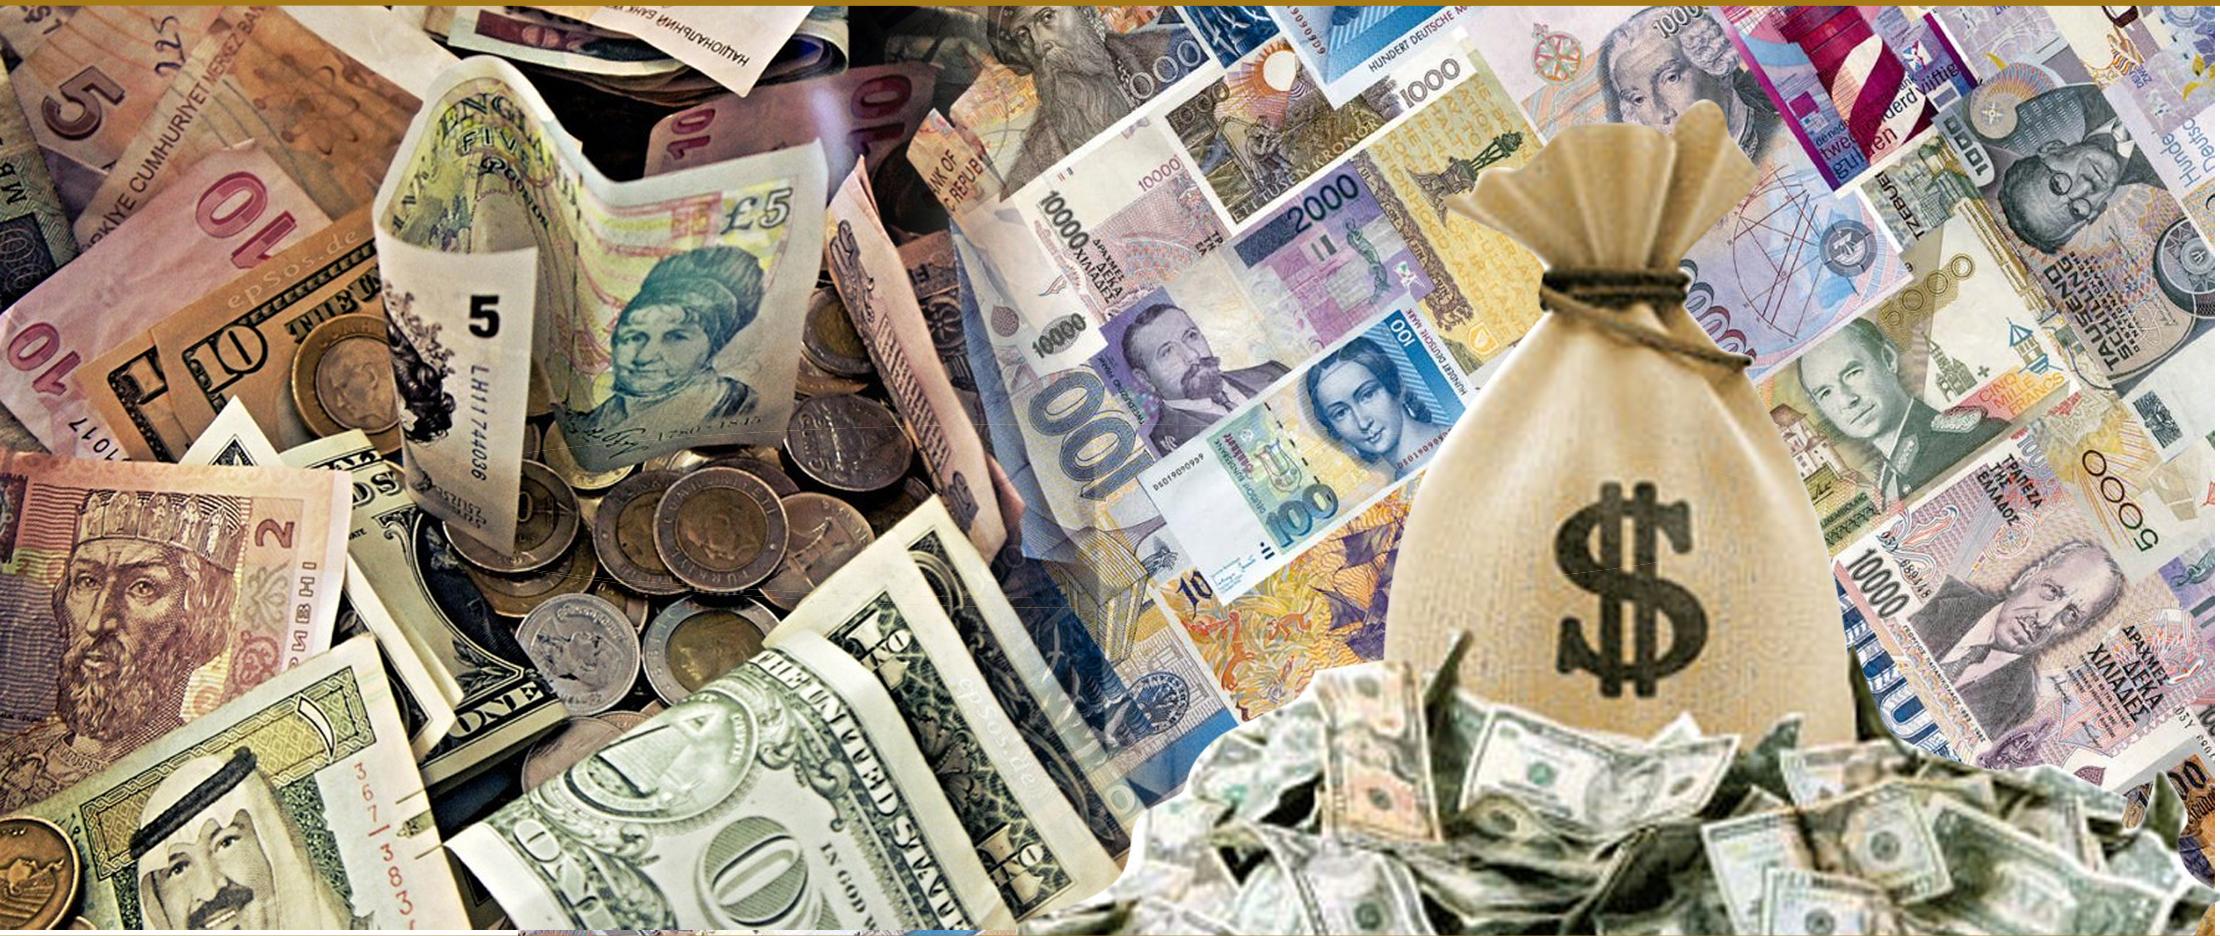 win money changer kk myanmar business group